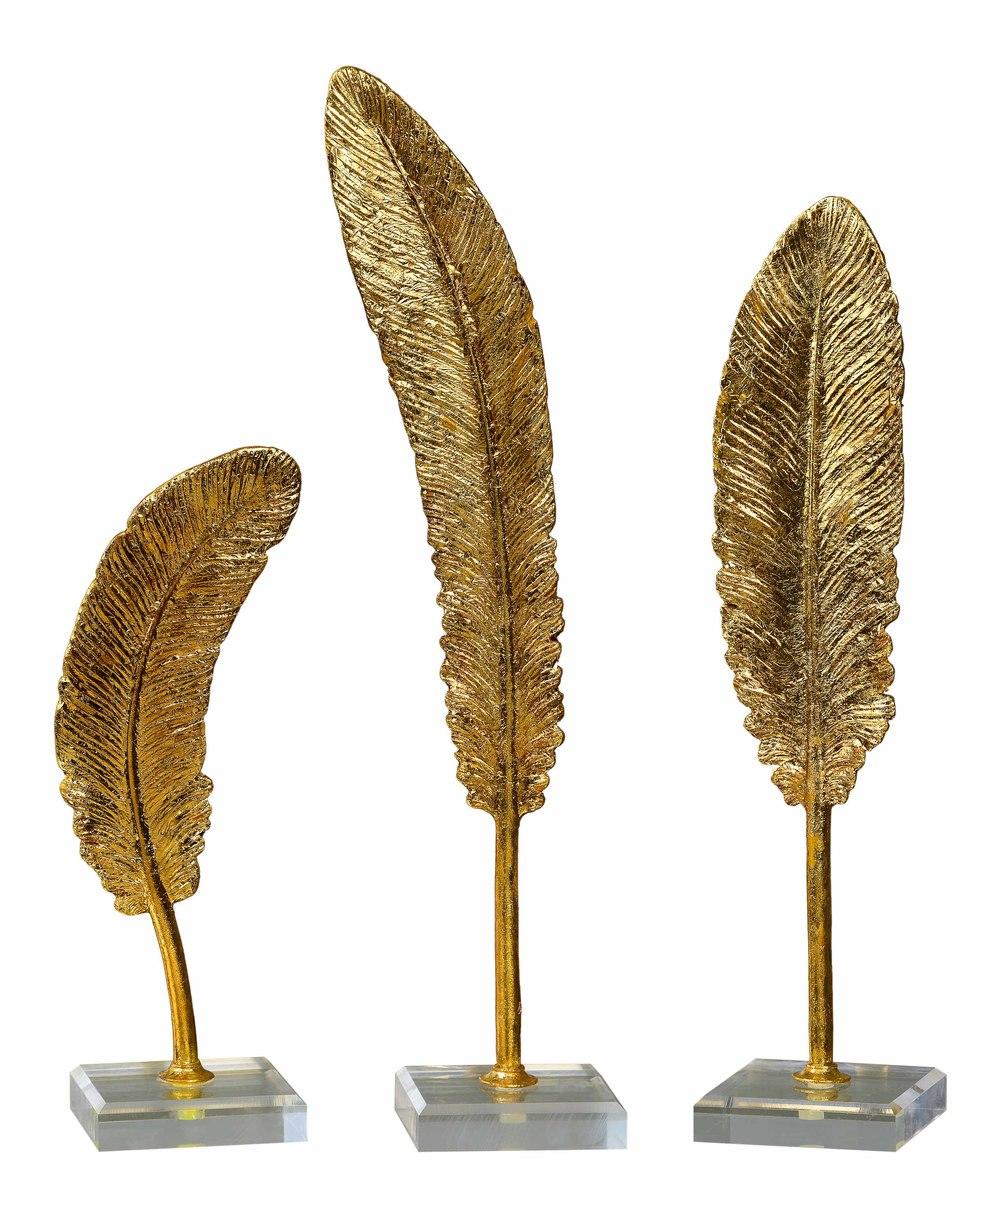 Uttermost Company - Feathers Sculpture, Set/3